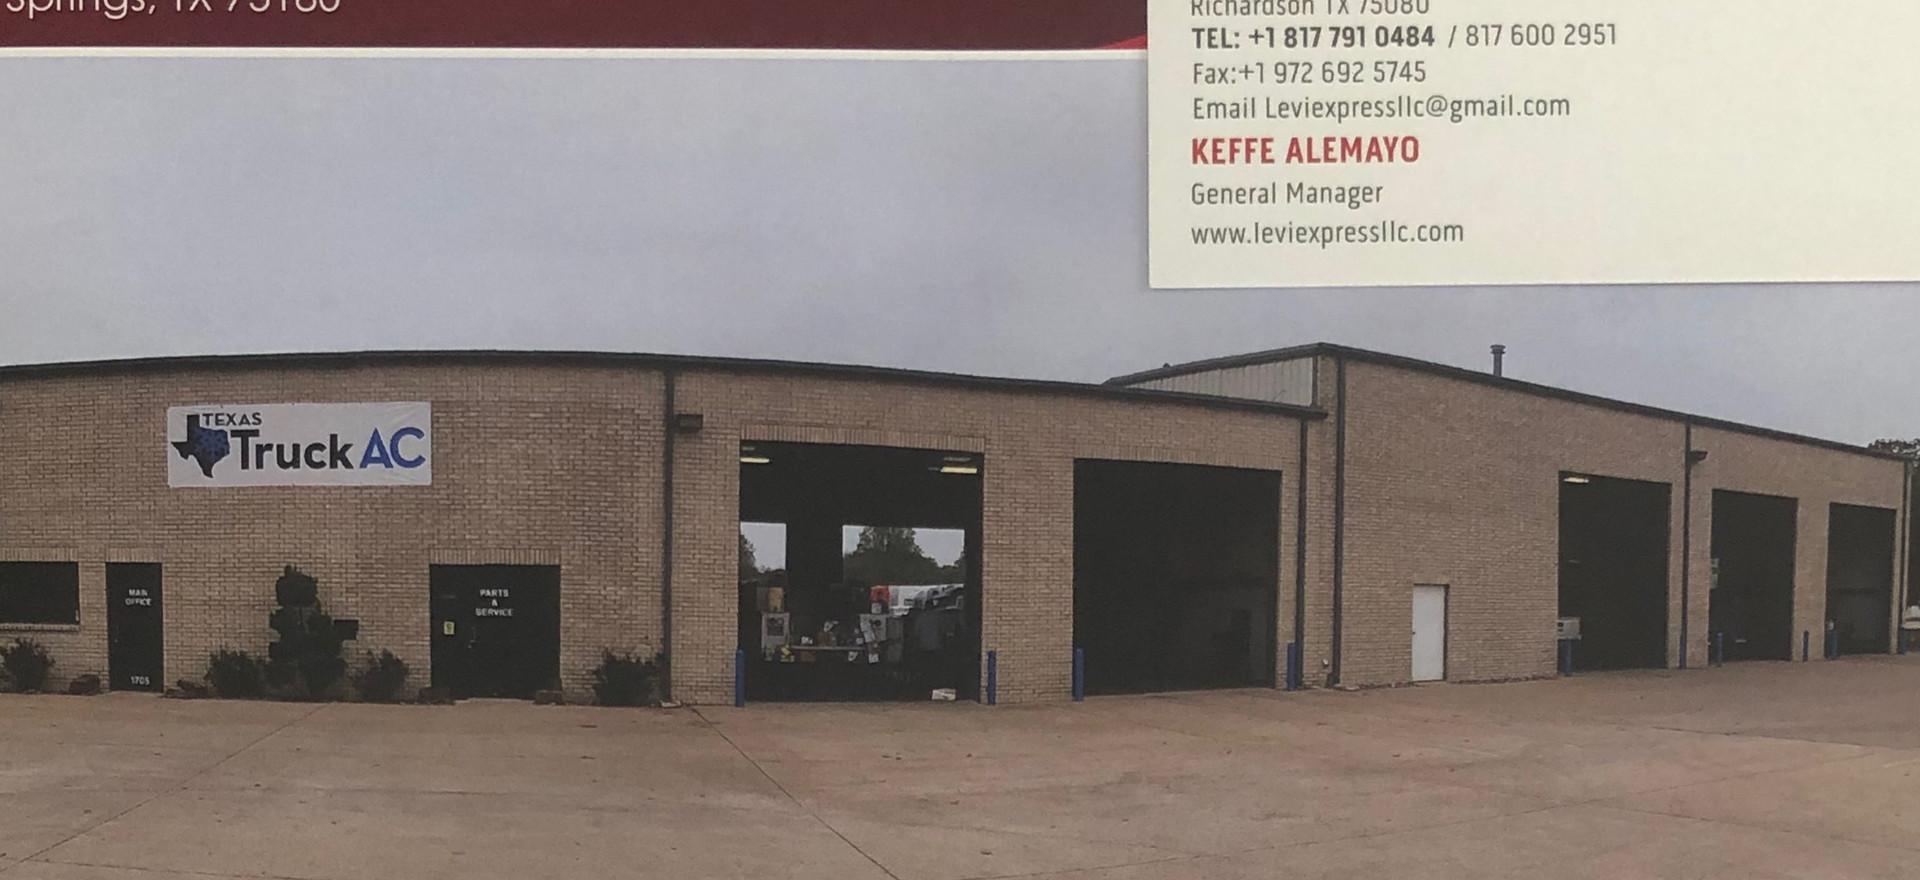 LEVI Truck Repair Service & Tire